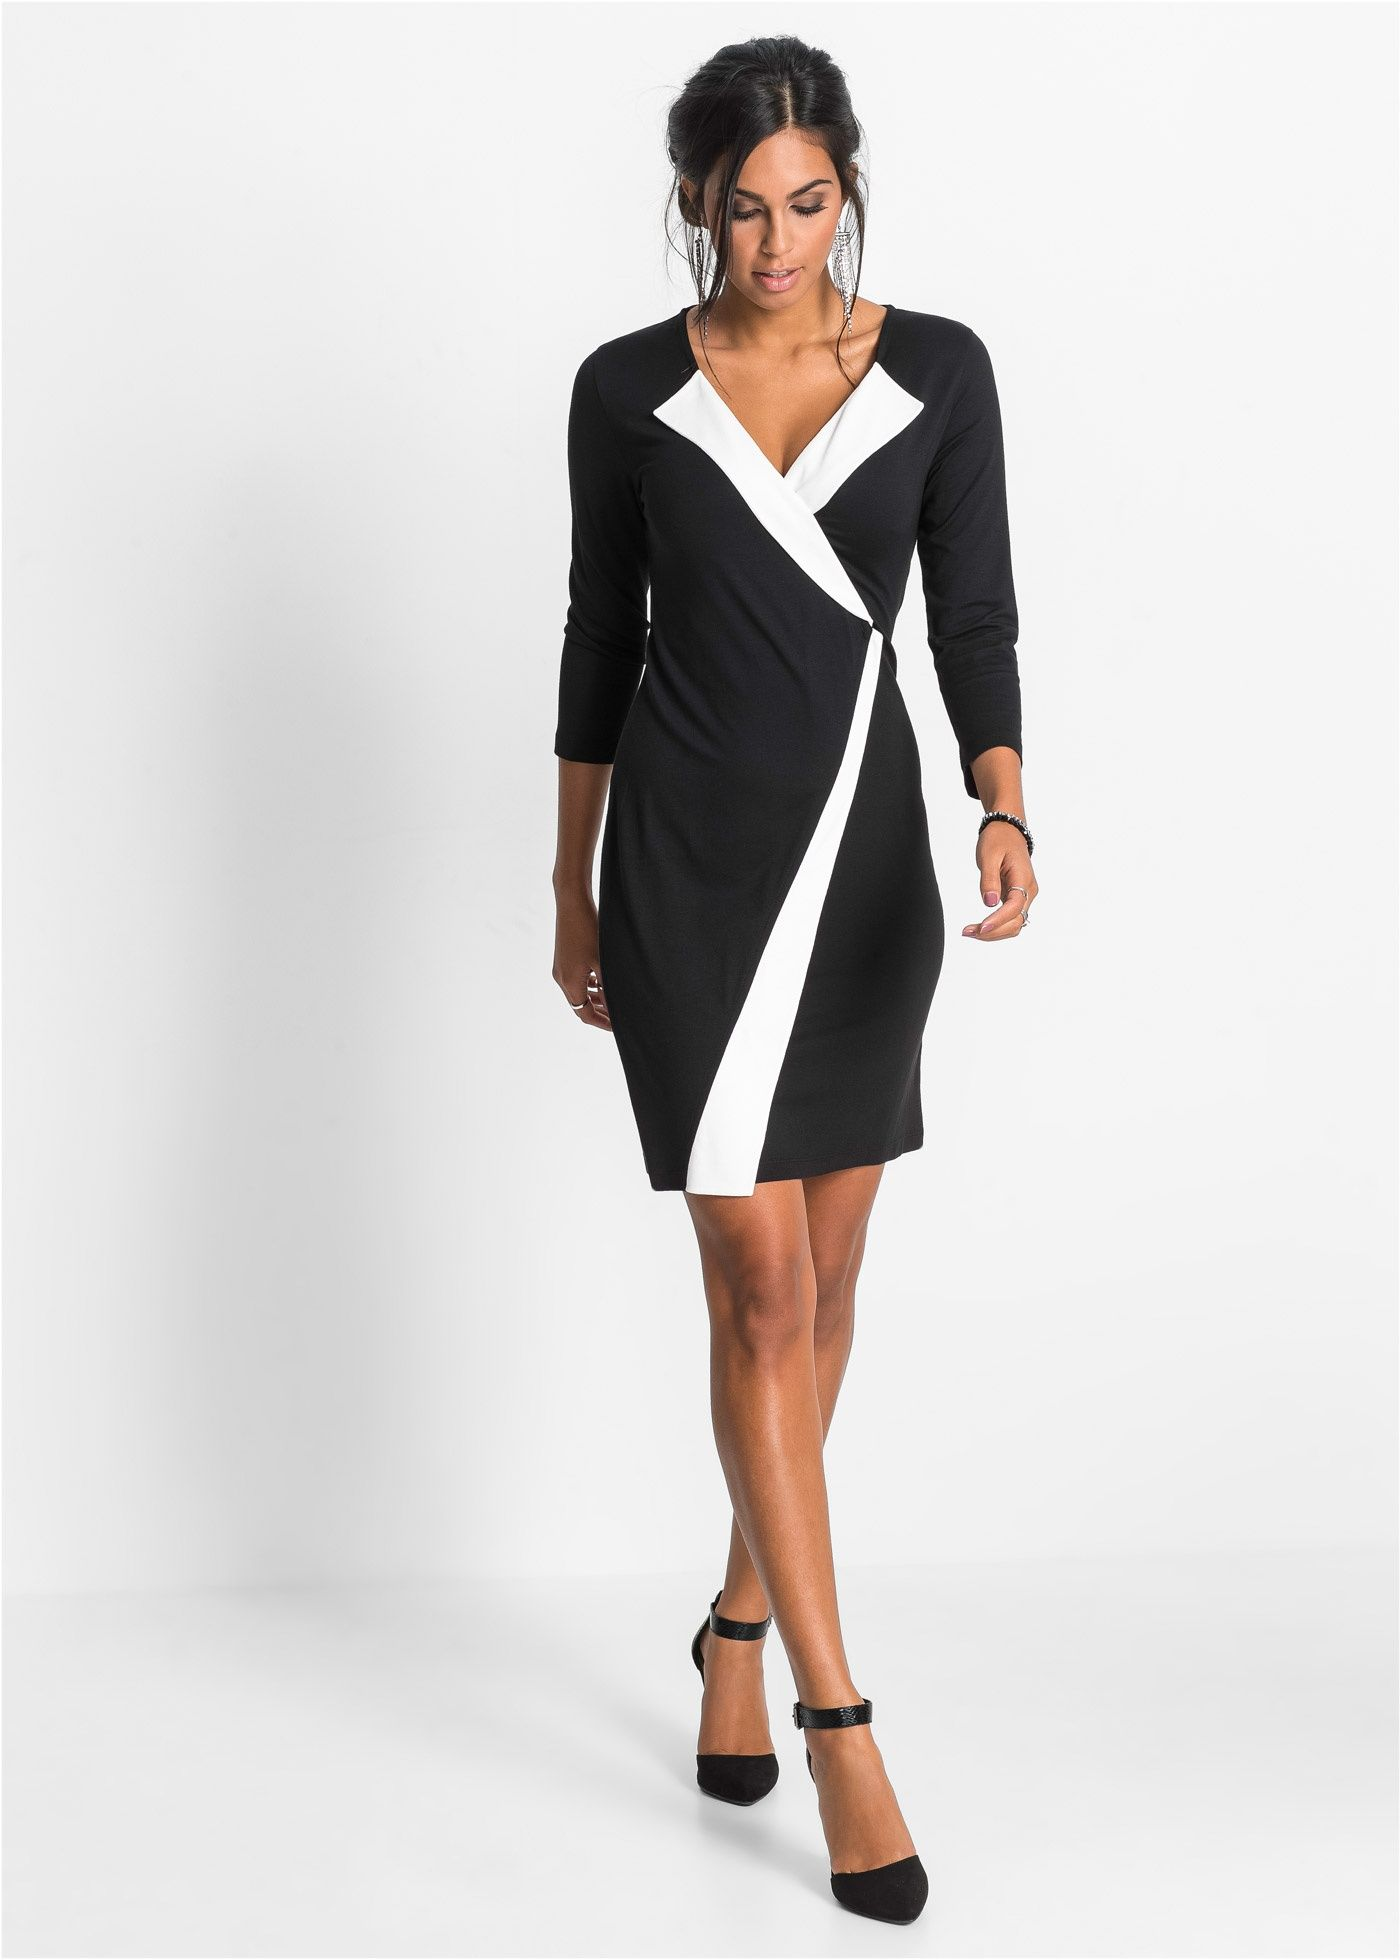 Commandez maintenant Robe jersey noir/blanc cassé - BODYFLIRT à partir de  32,99